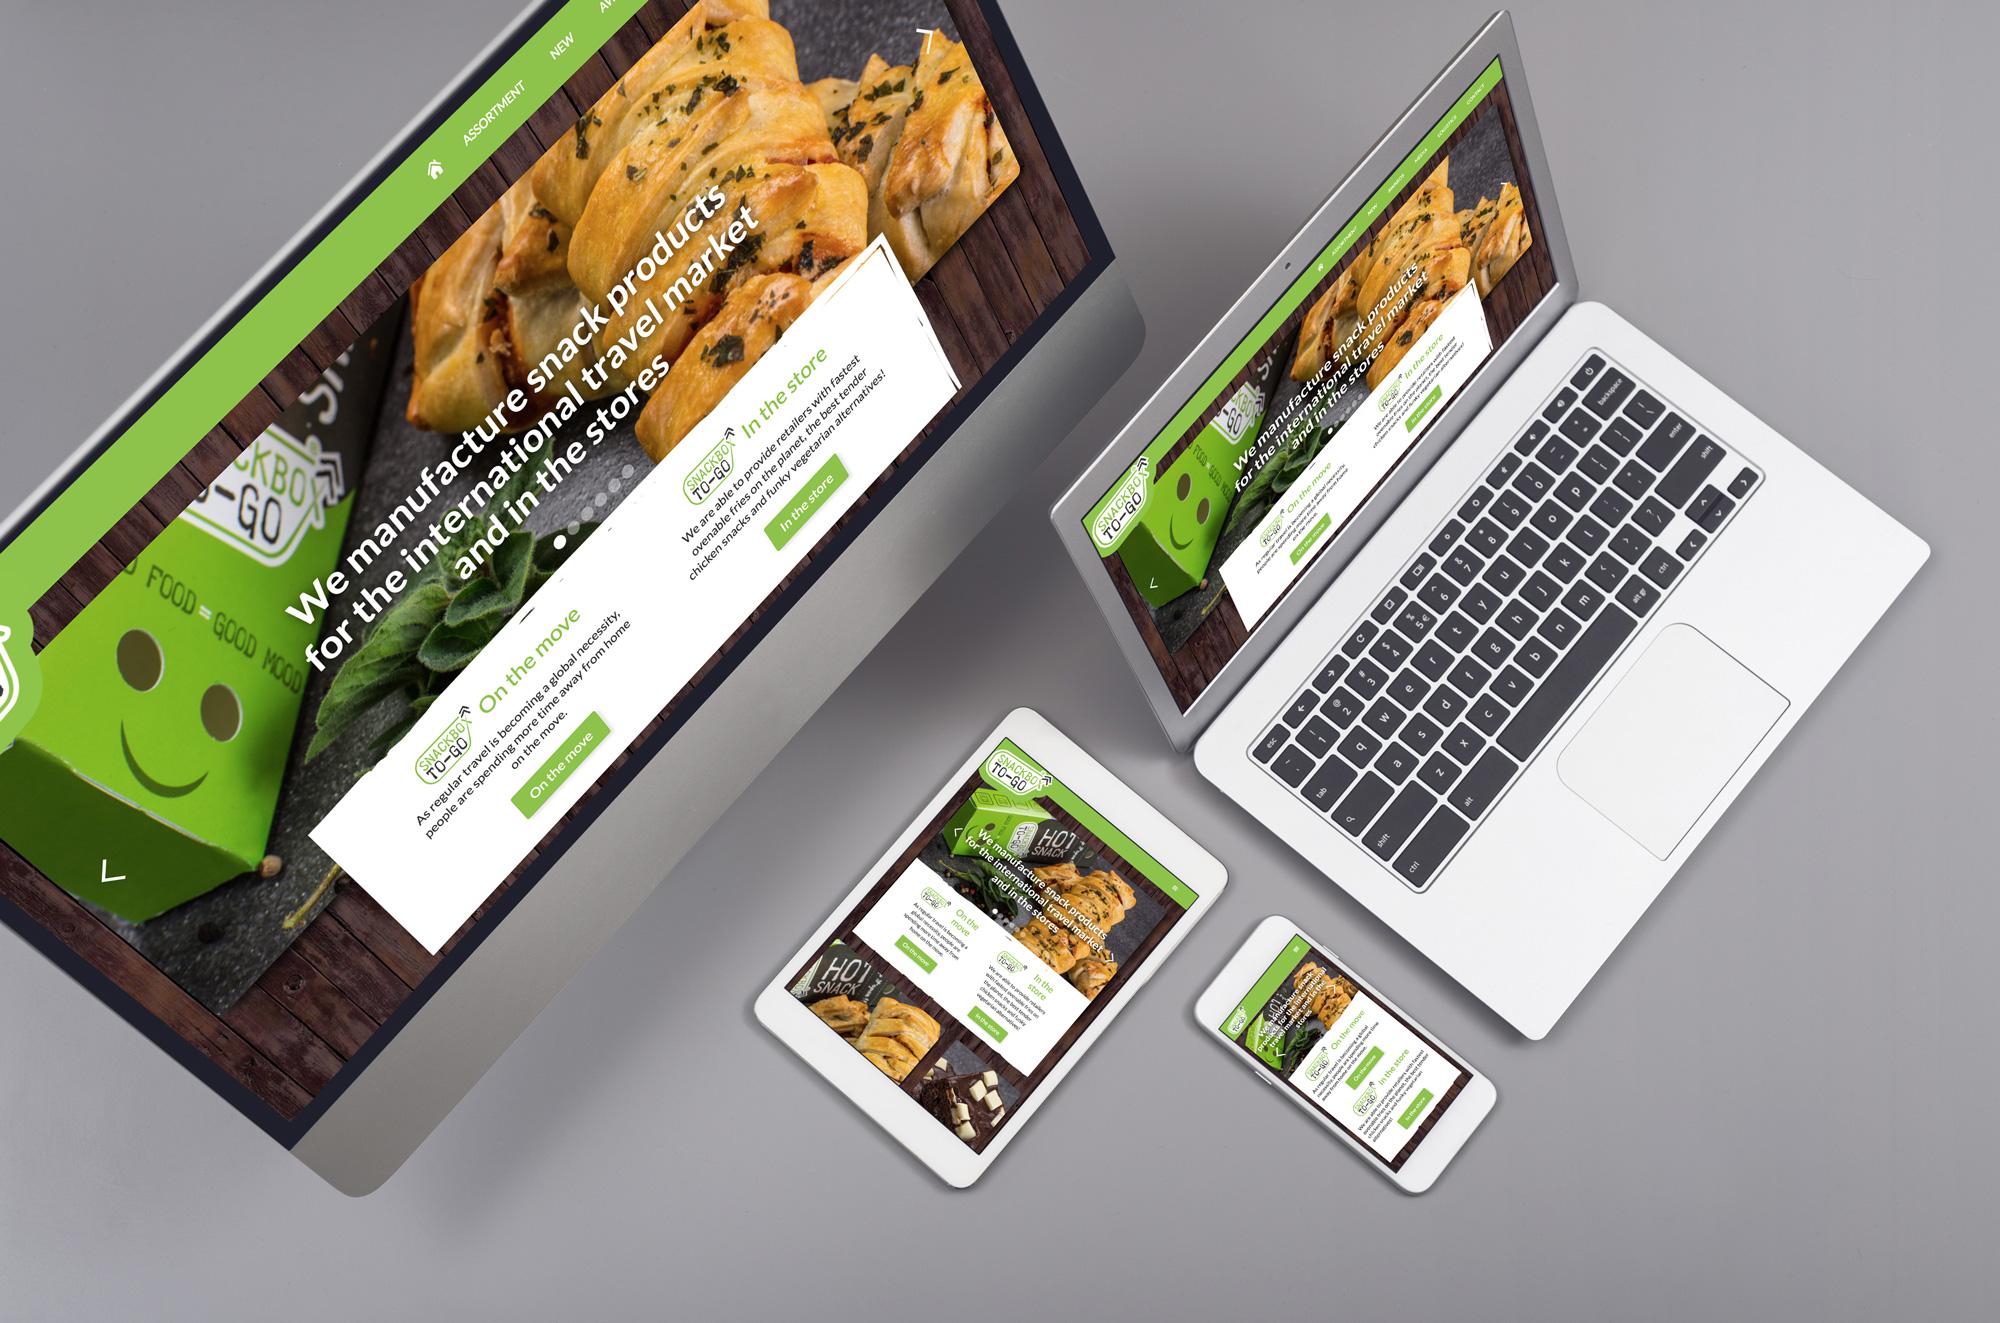 snackboxtogo webflow website